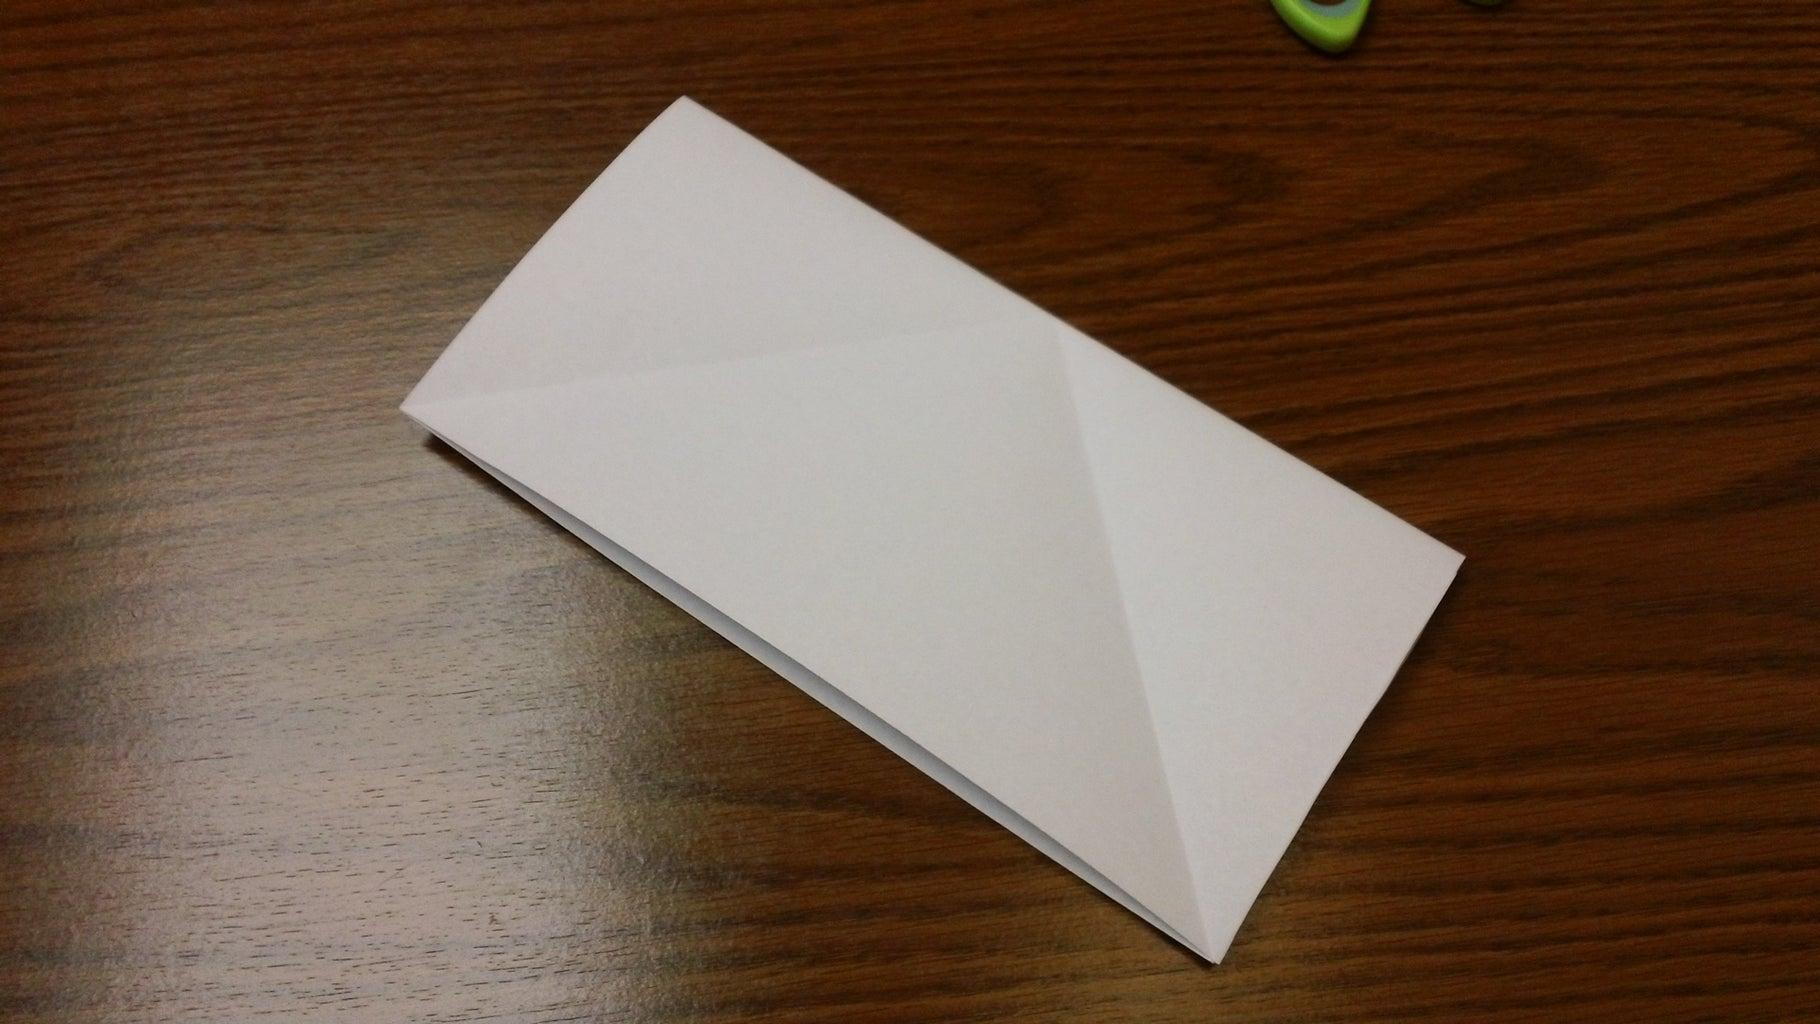 Fold the Square Into a Triangle